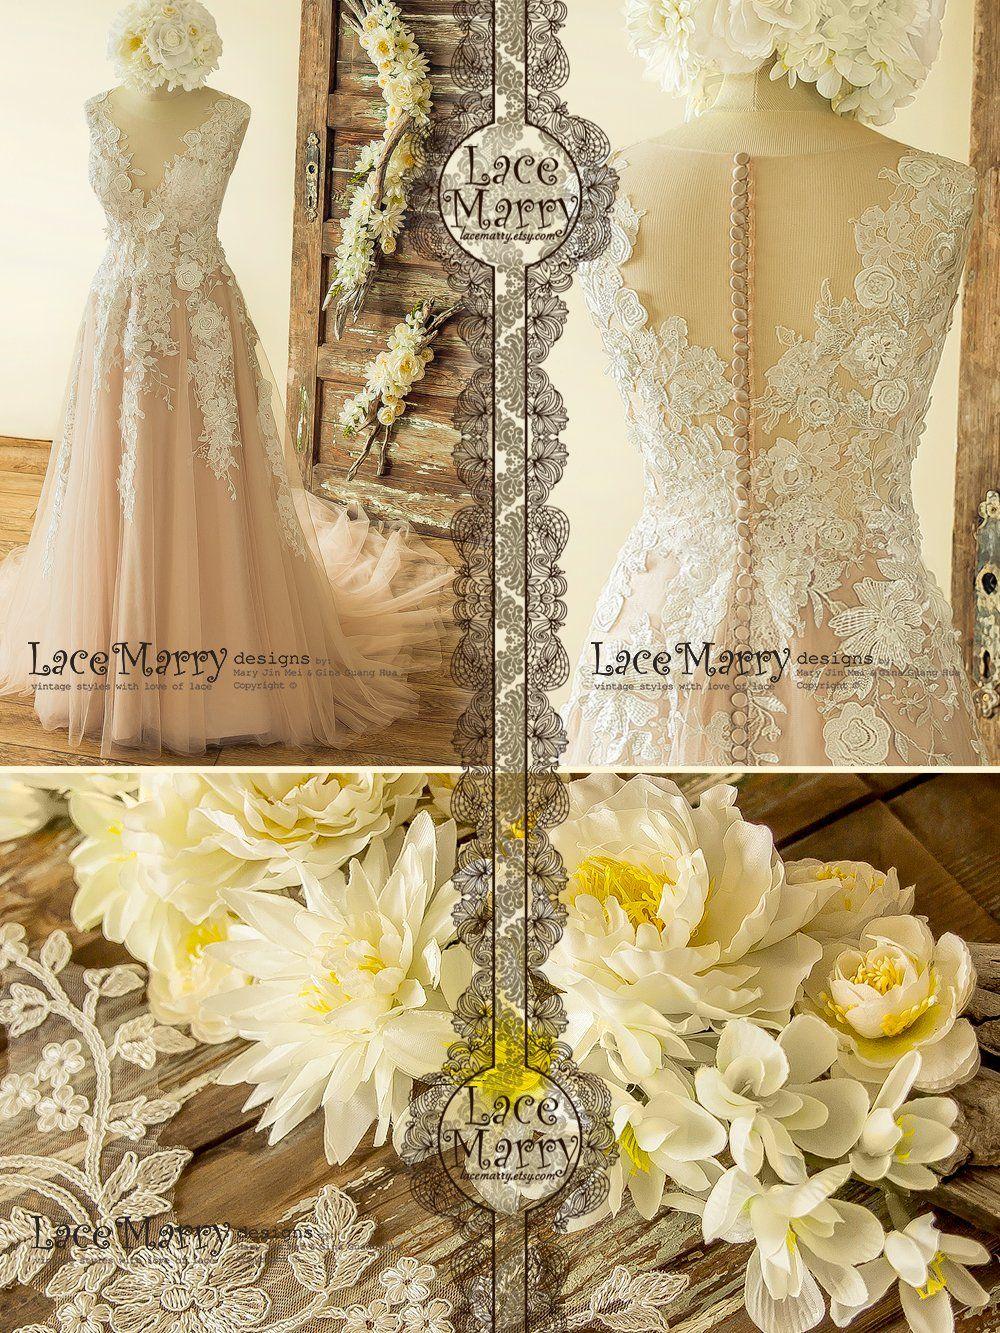 Boho blush wedding dress with ivory lace d flower appliques vcut